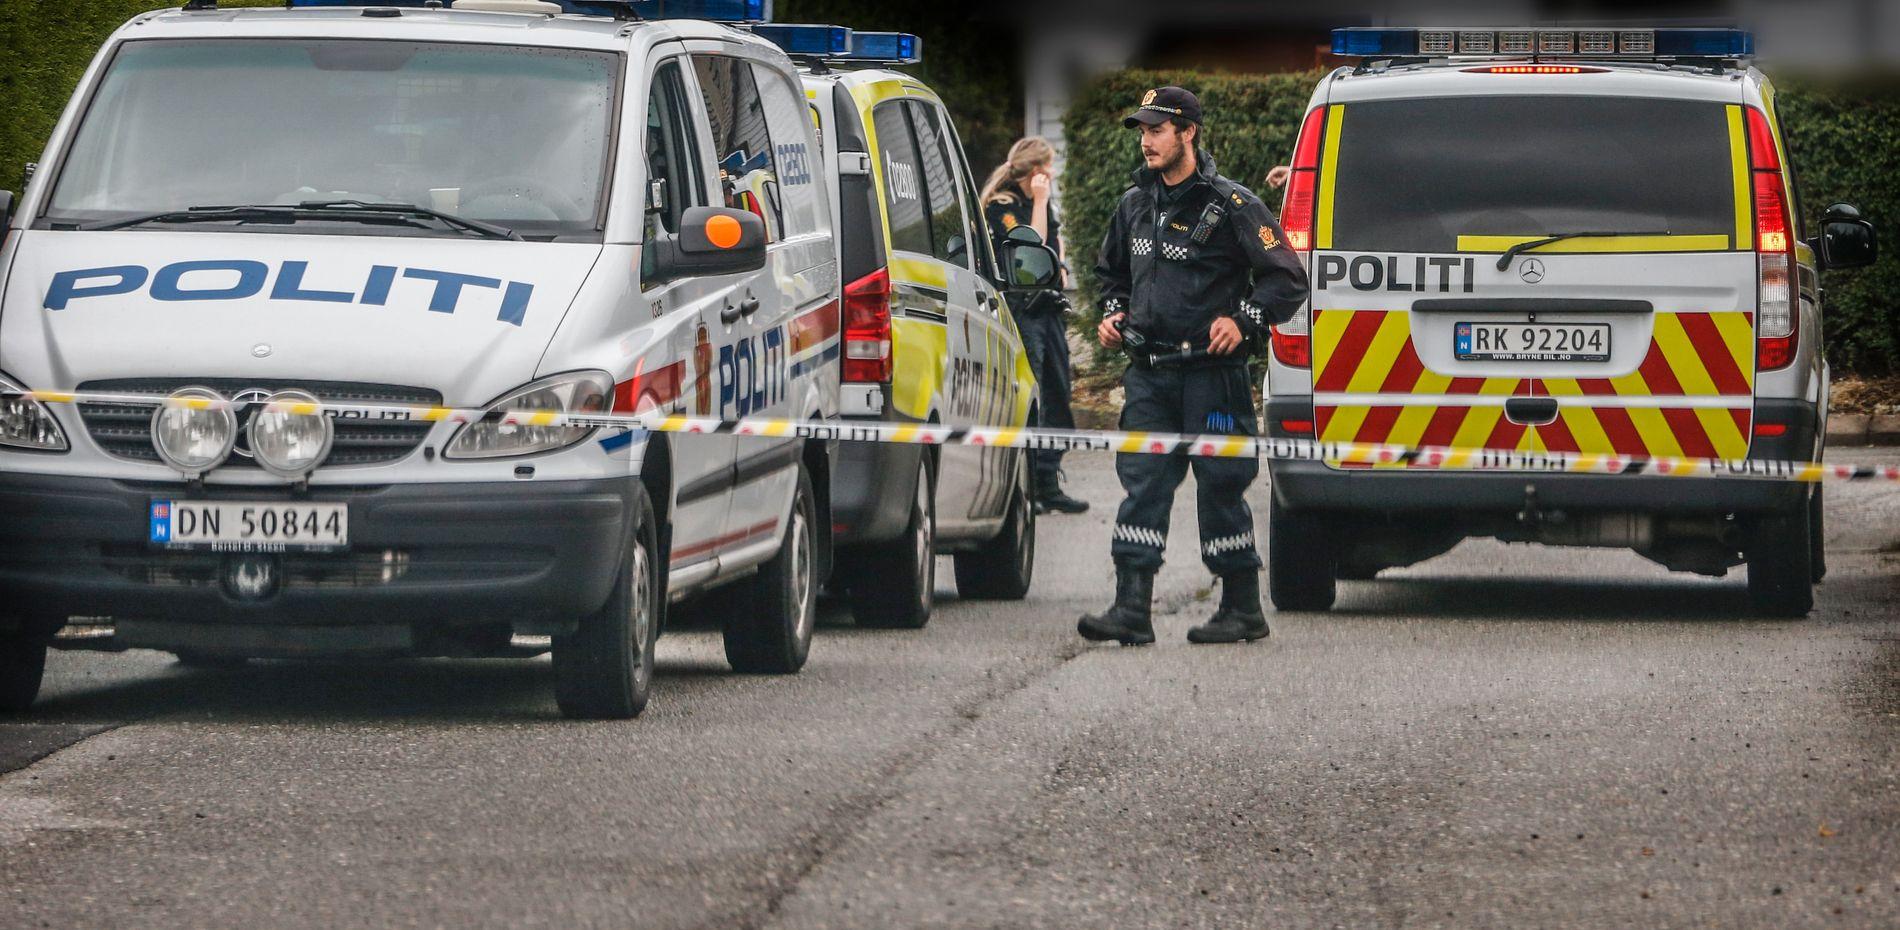 Politiet er på siktedes bolig med minst tre patruljer tirsdag formiddag.